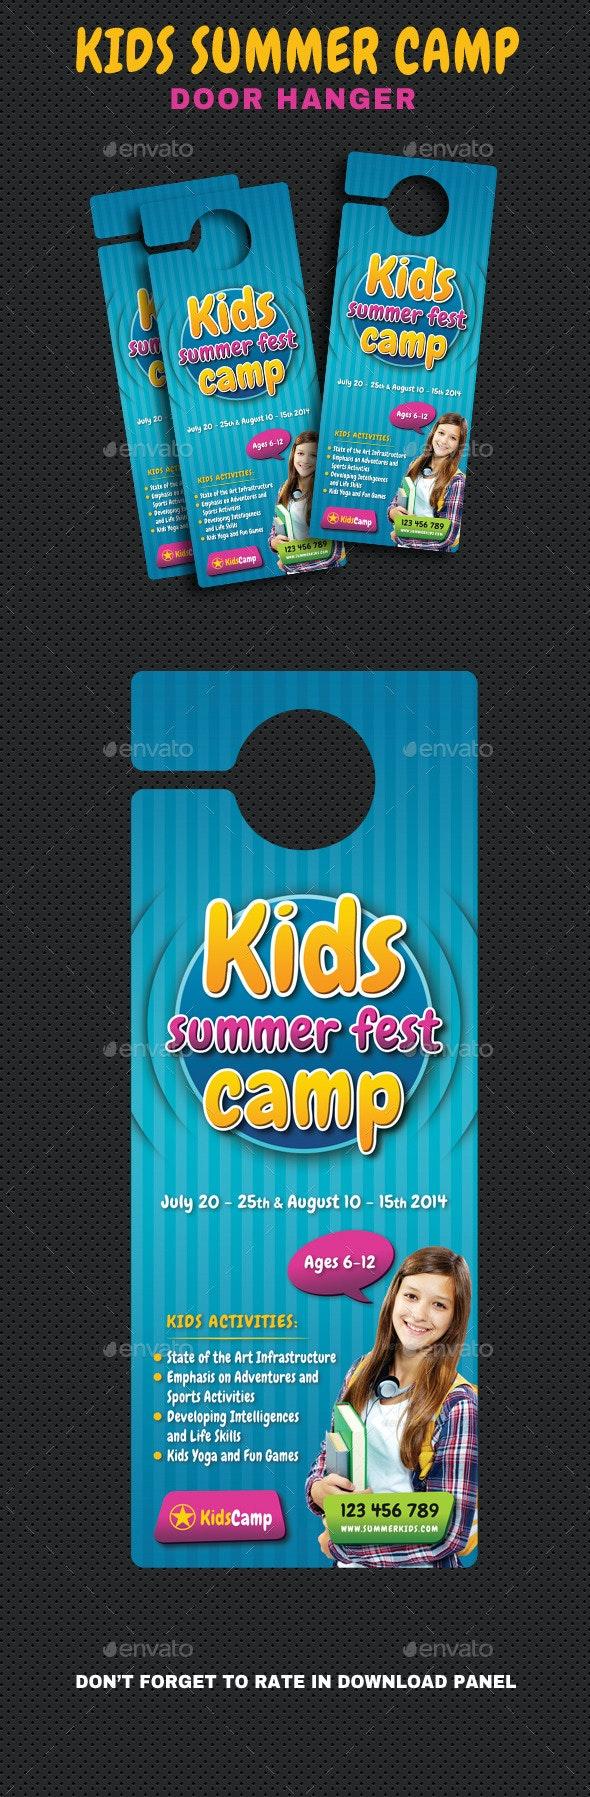 Kids Summer Camp Door Hanger V01 - Miscellaneous Print Templates